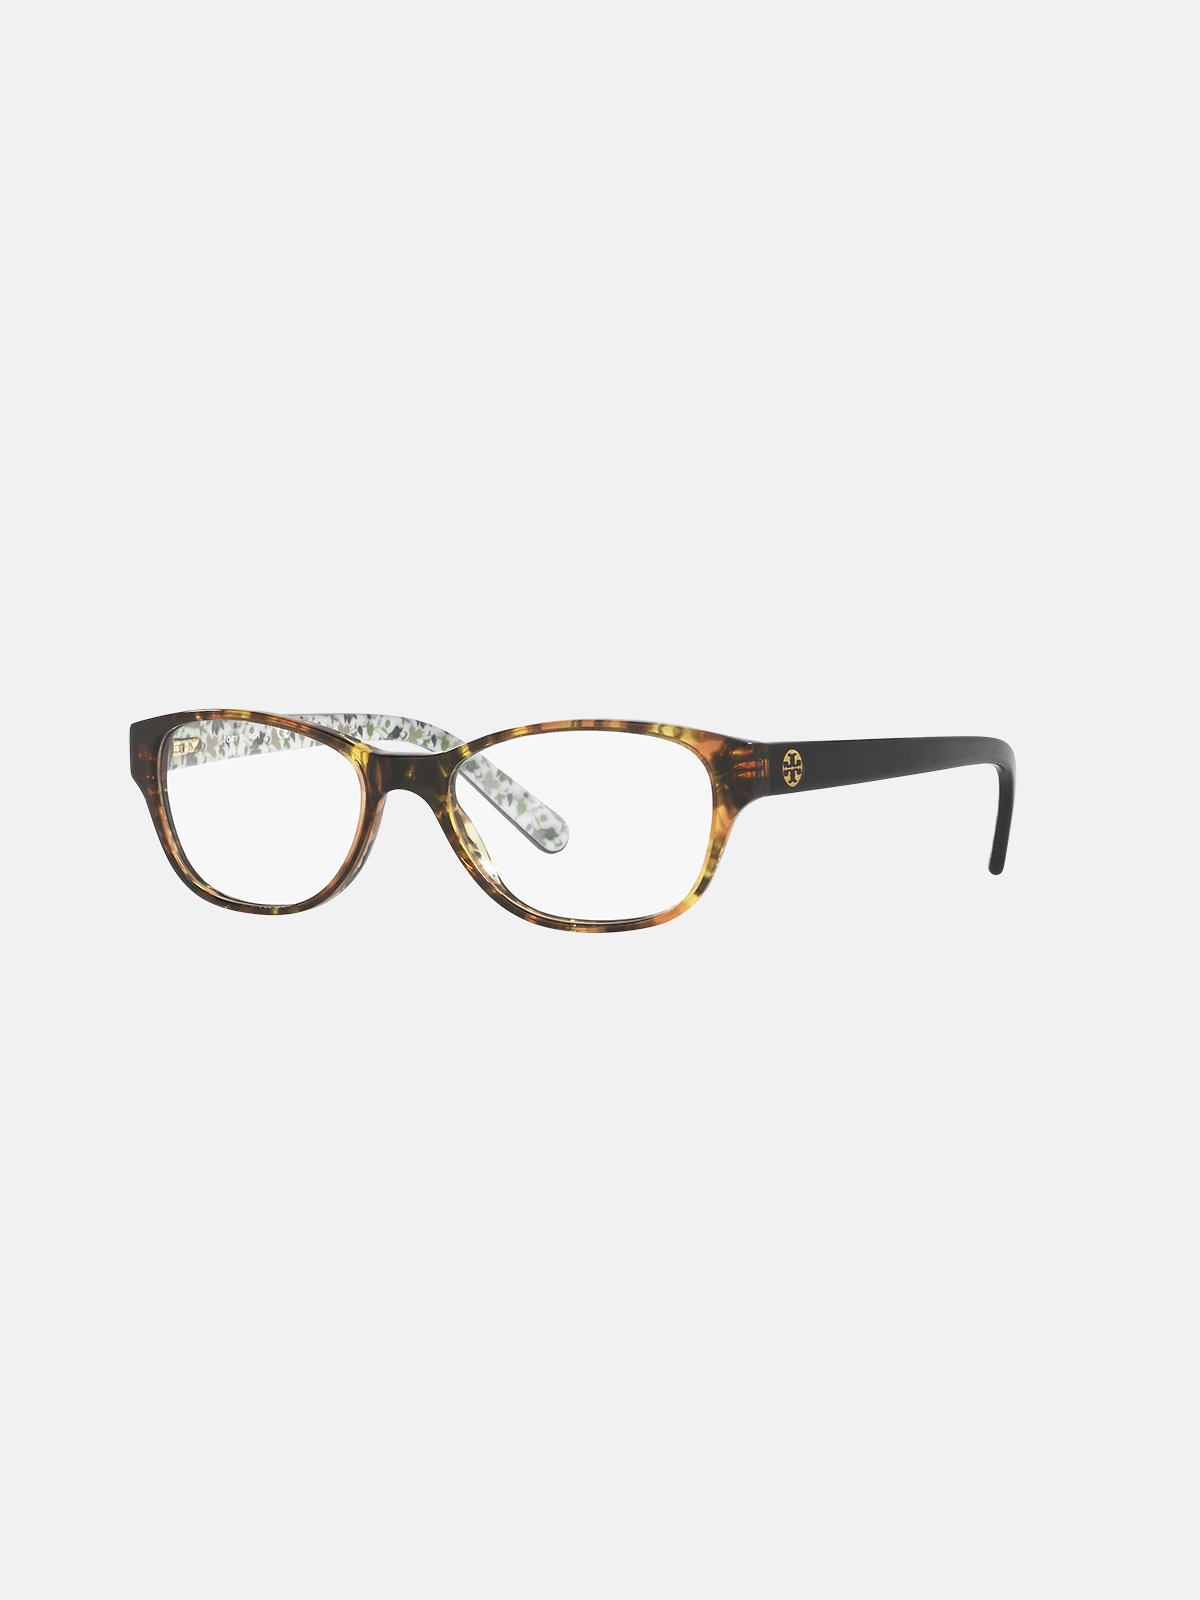 3d2e344baa95 Tory Burch TY2031 | Glasses.com® | Free Shipping